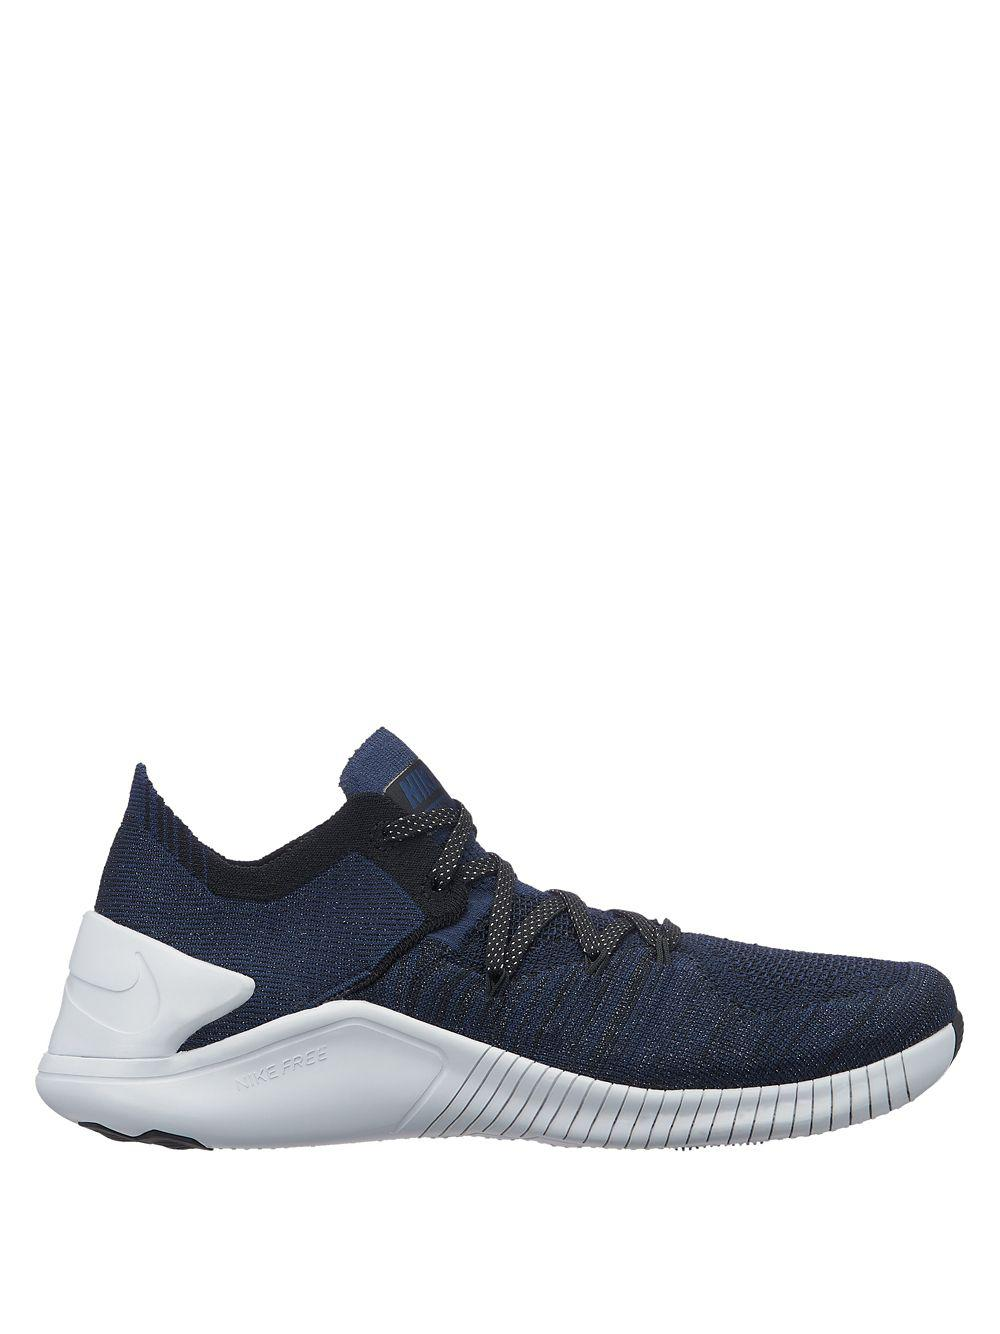 meet e6ab3 94433 Nike Free Tr Flyknit 3 Metallic in Blue - Save 47% - Lyst